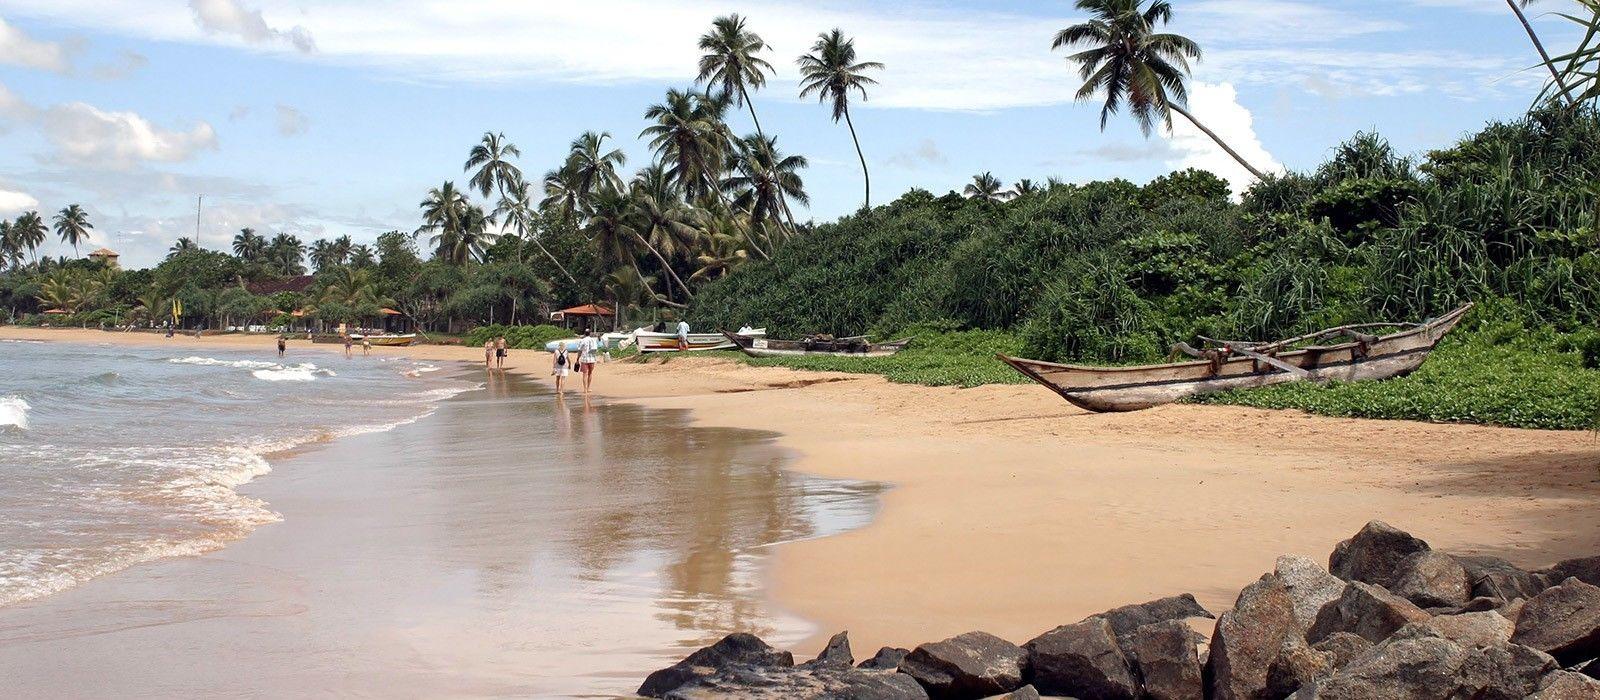 Culture and Beach Wonders of Sri Lanka Tour Trip 1